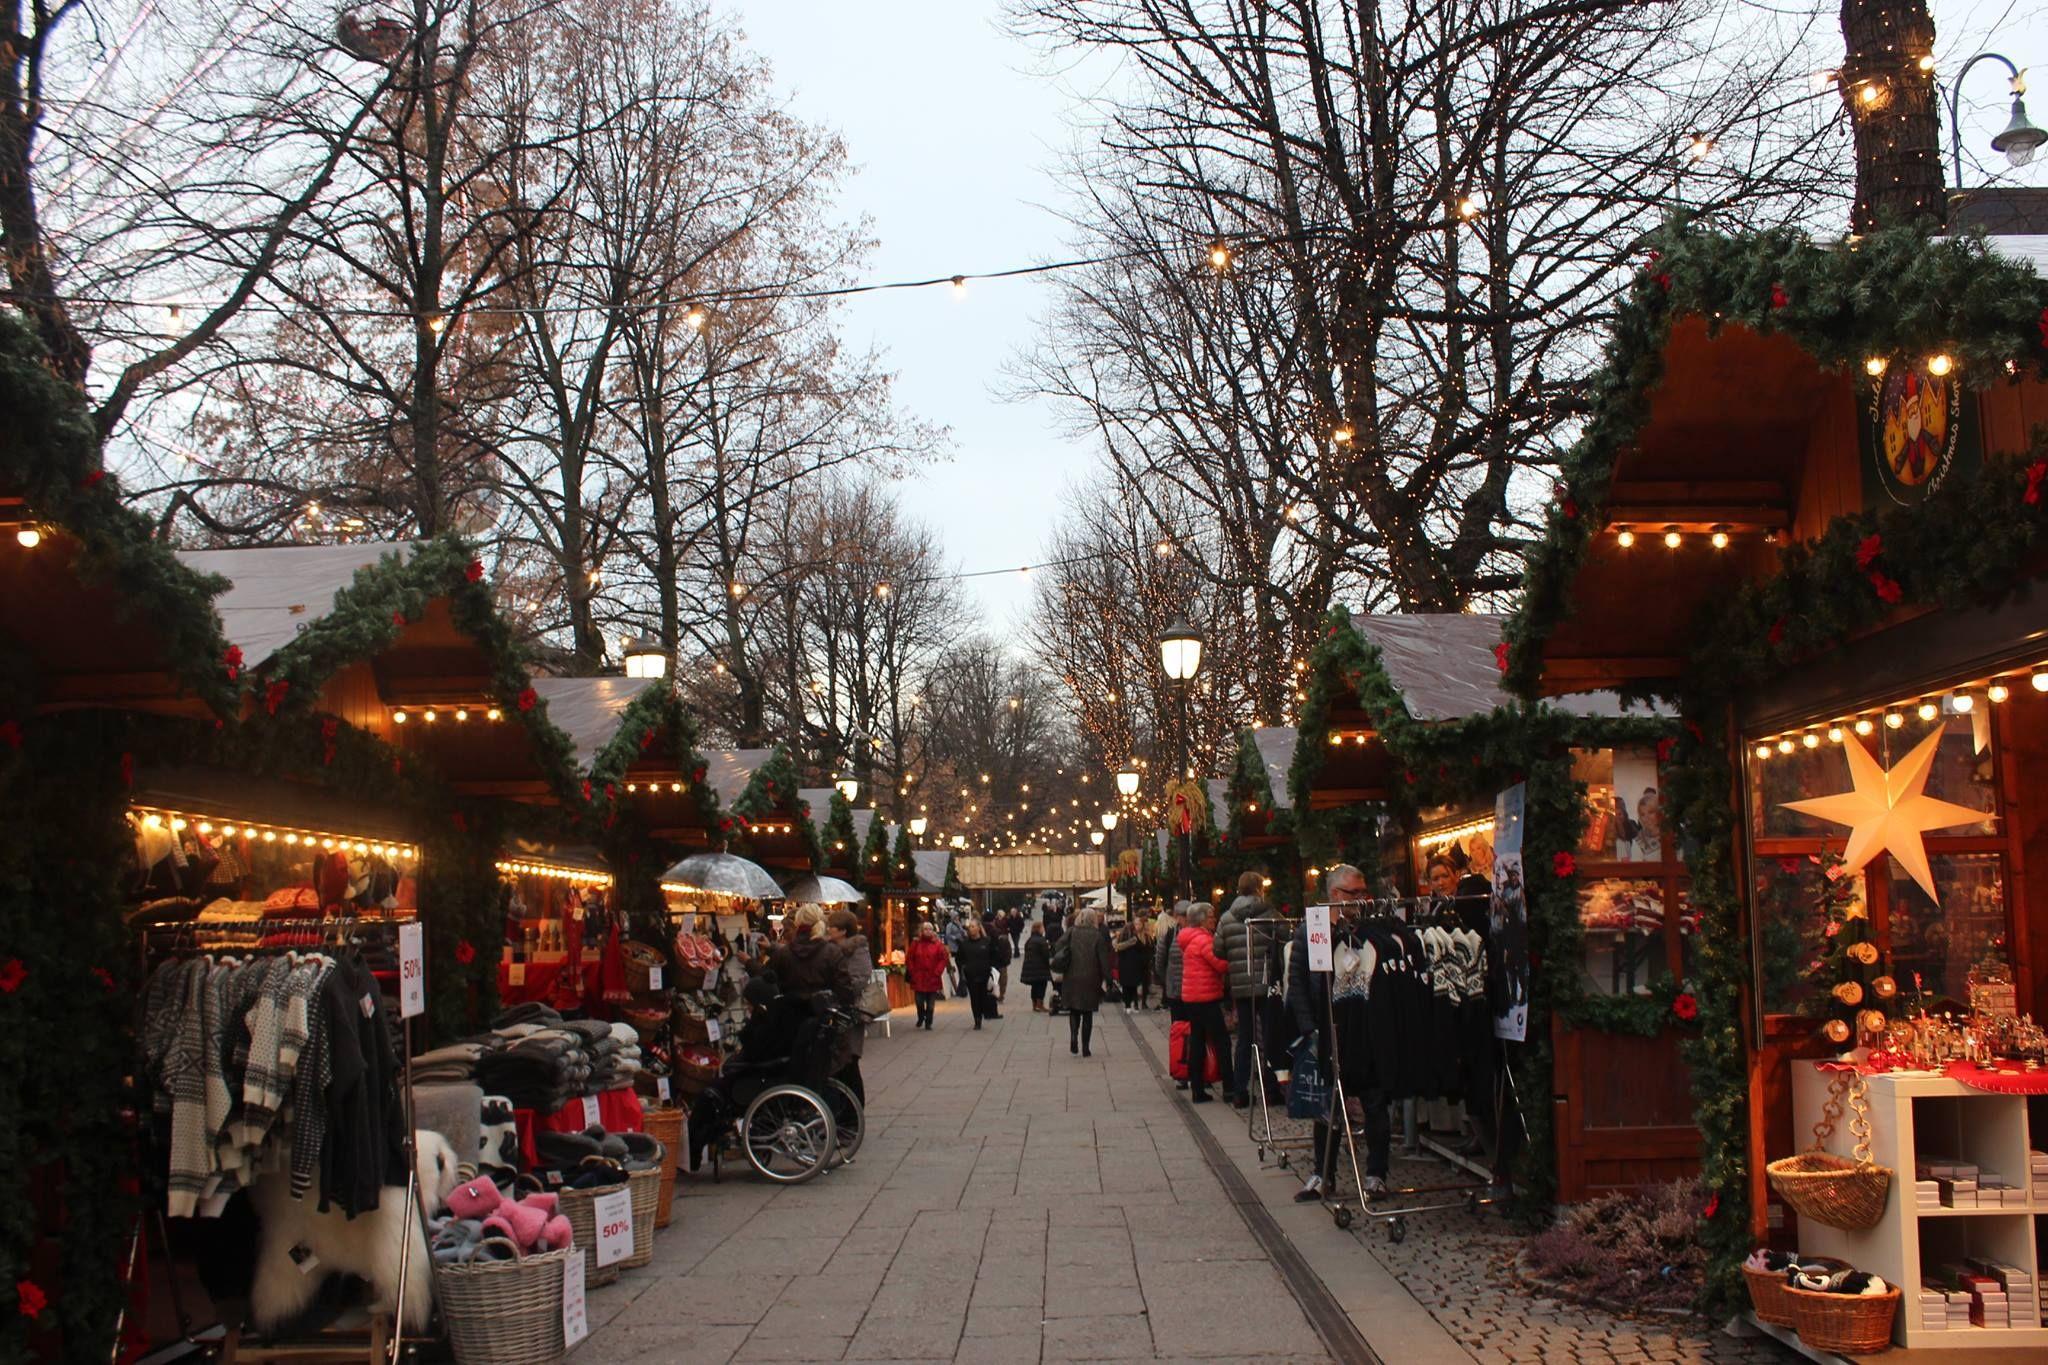 Christmas market, Oslo, Norway | European Christmas | Pinterest ...